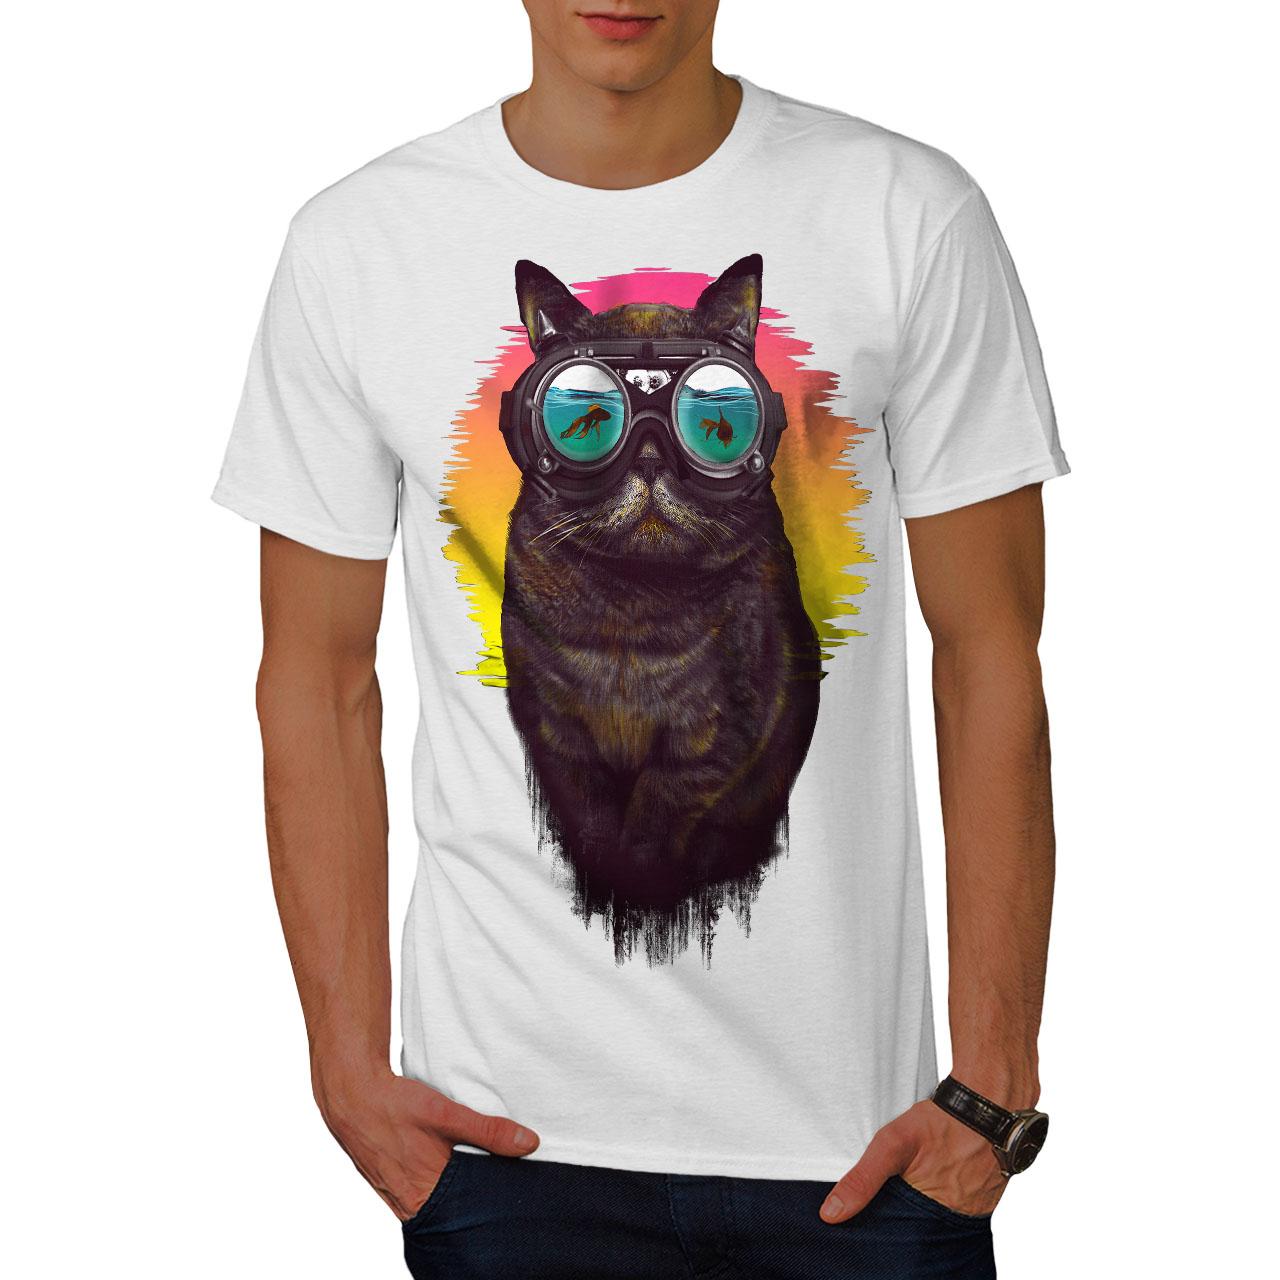 Wellcoda-Hippie-Glasses-Cool-Cat-Mens-T-shirt-Fish-Graphic-Design-Printed-Tee thumbnail 9